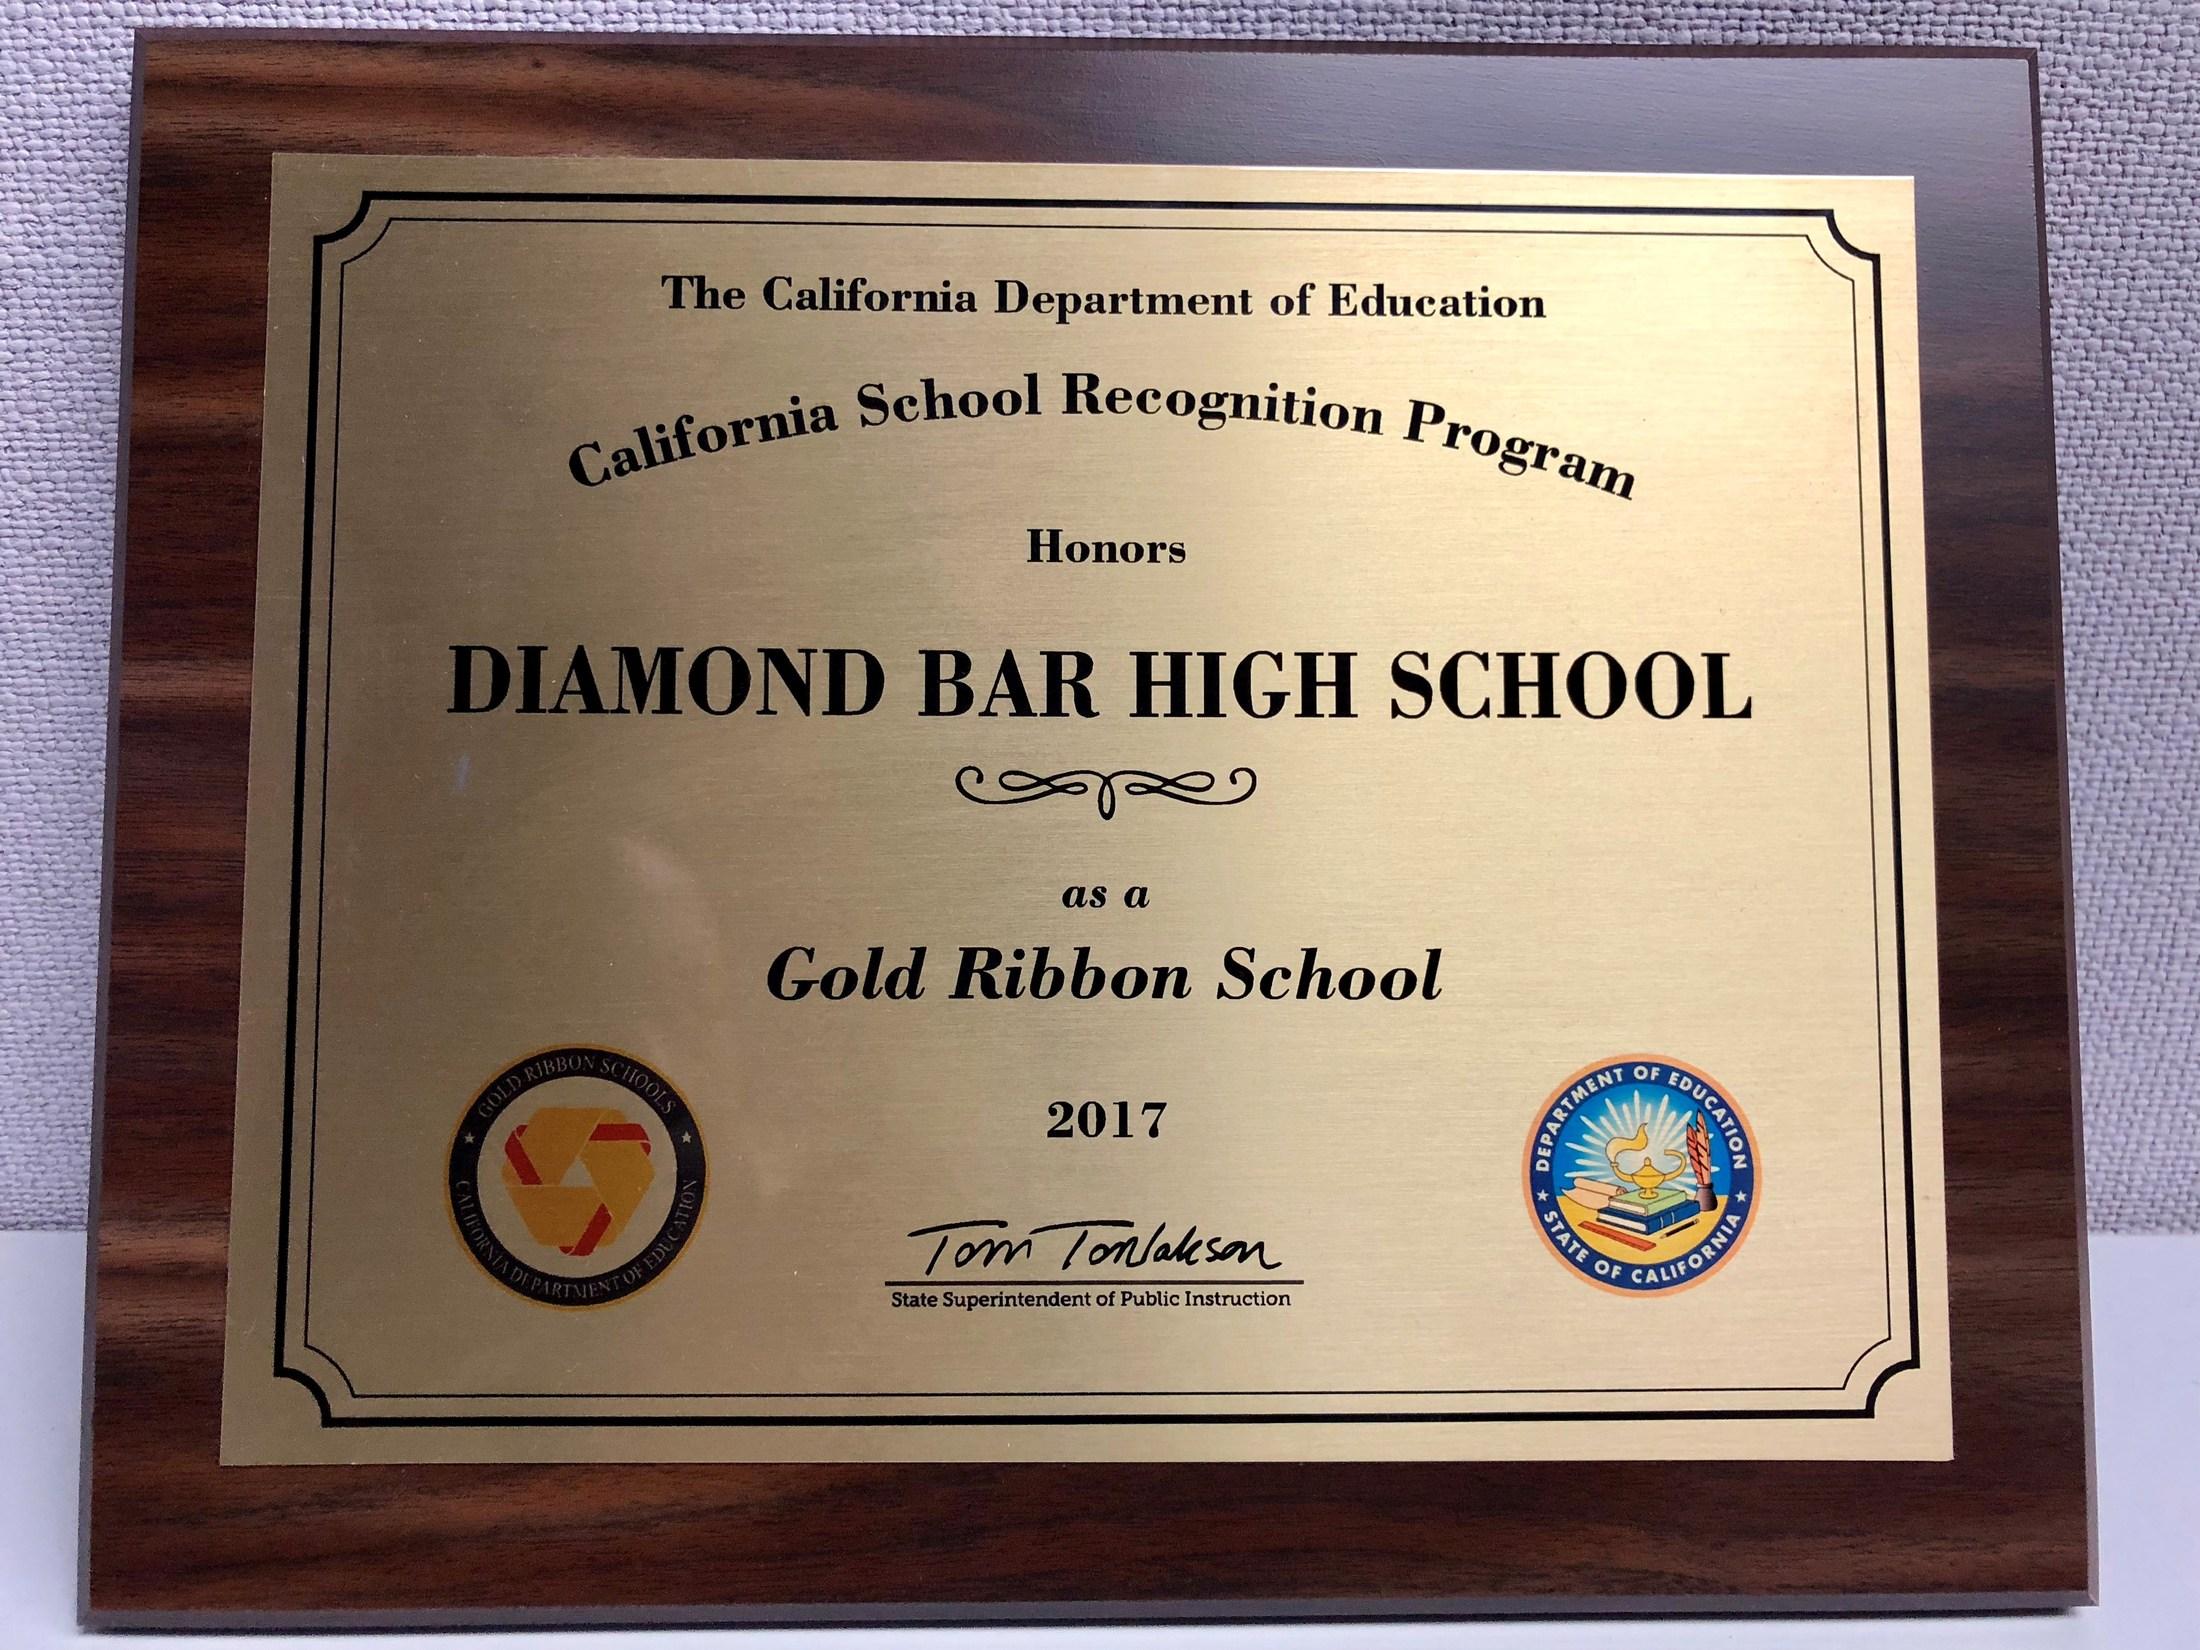 gold ribbon school 2017 awards diamond bar high school